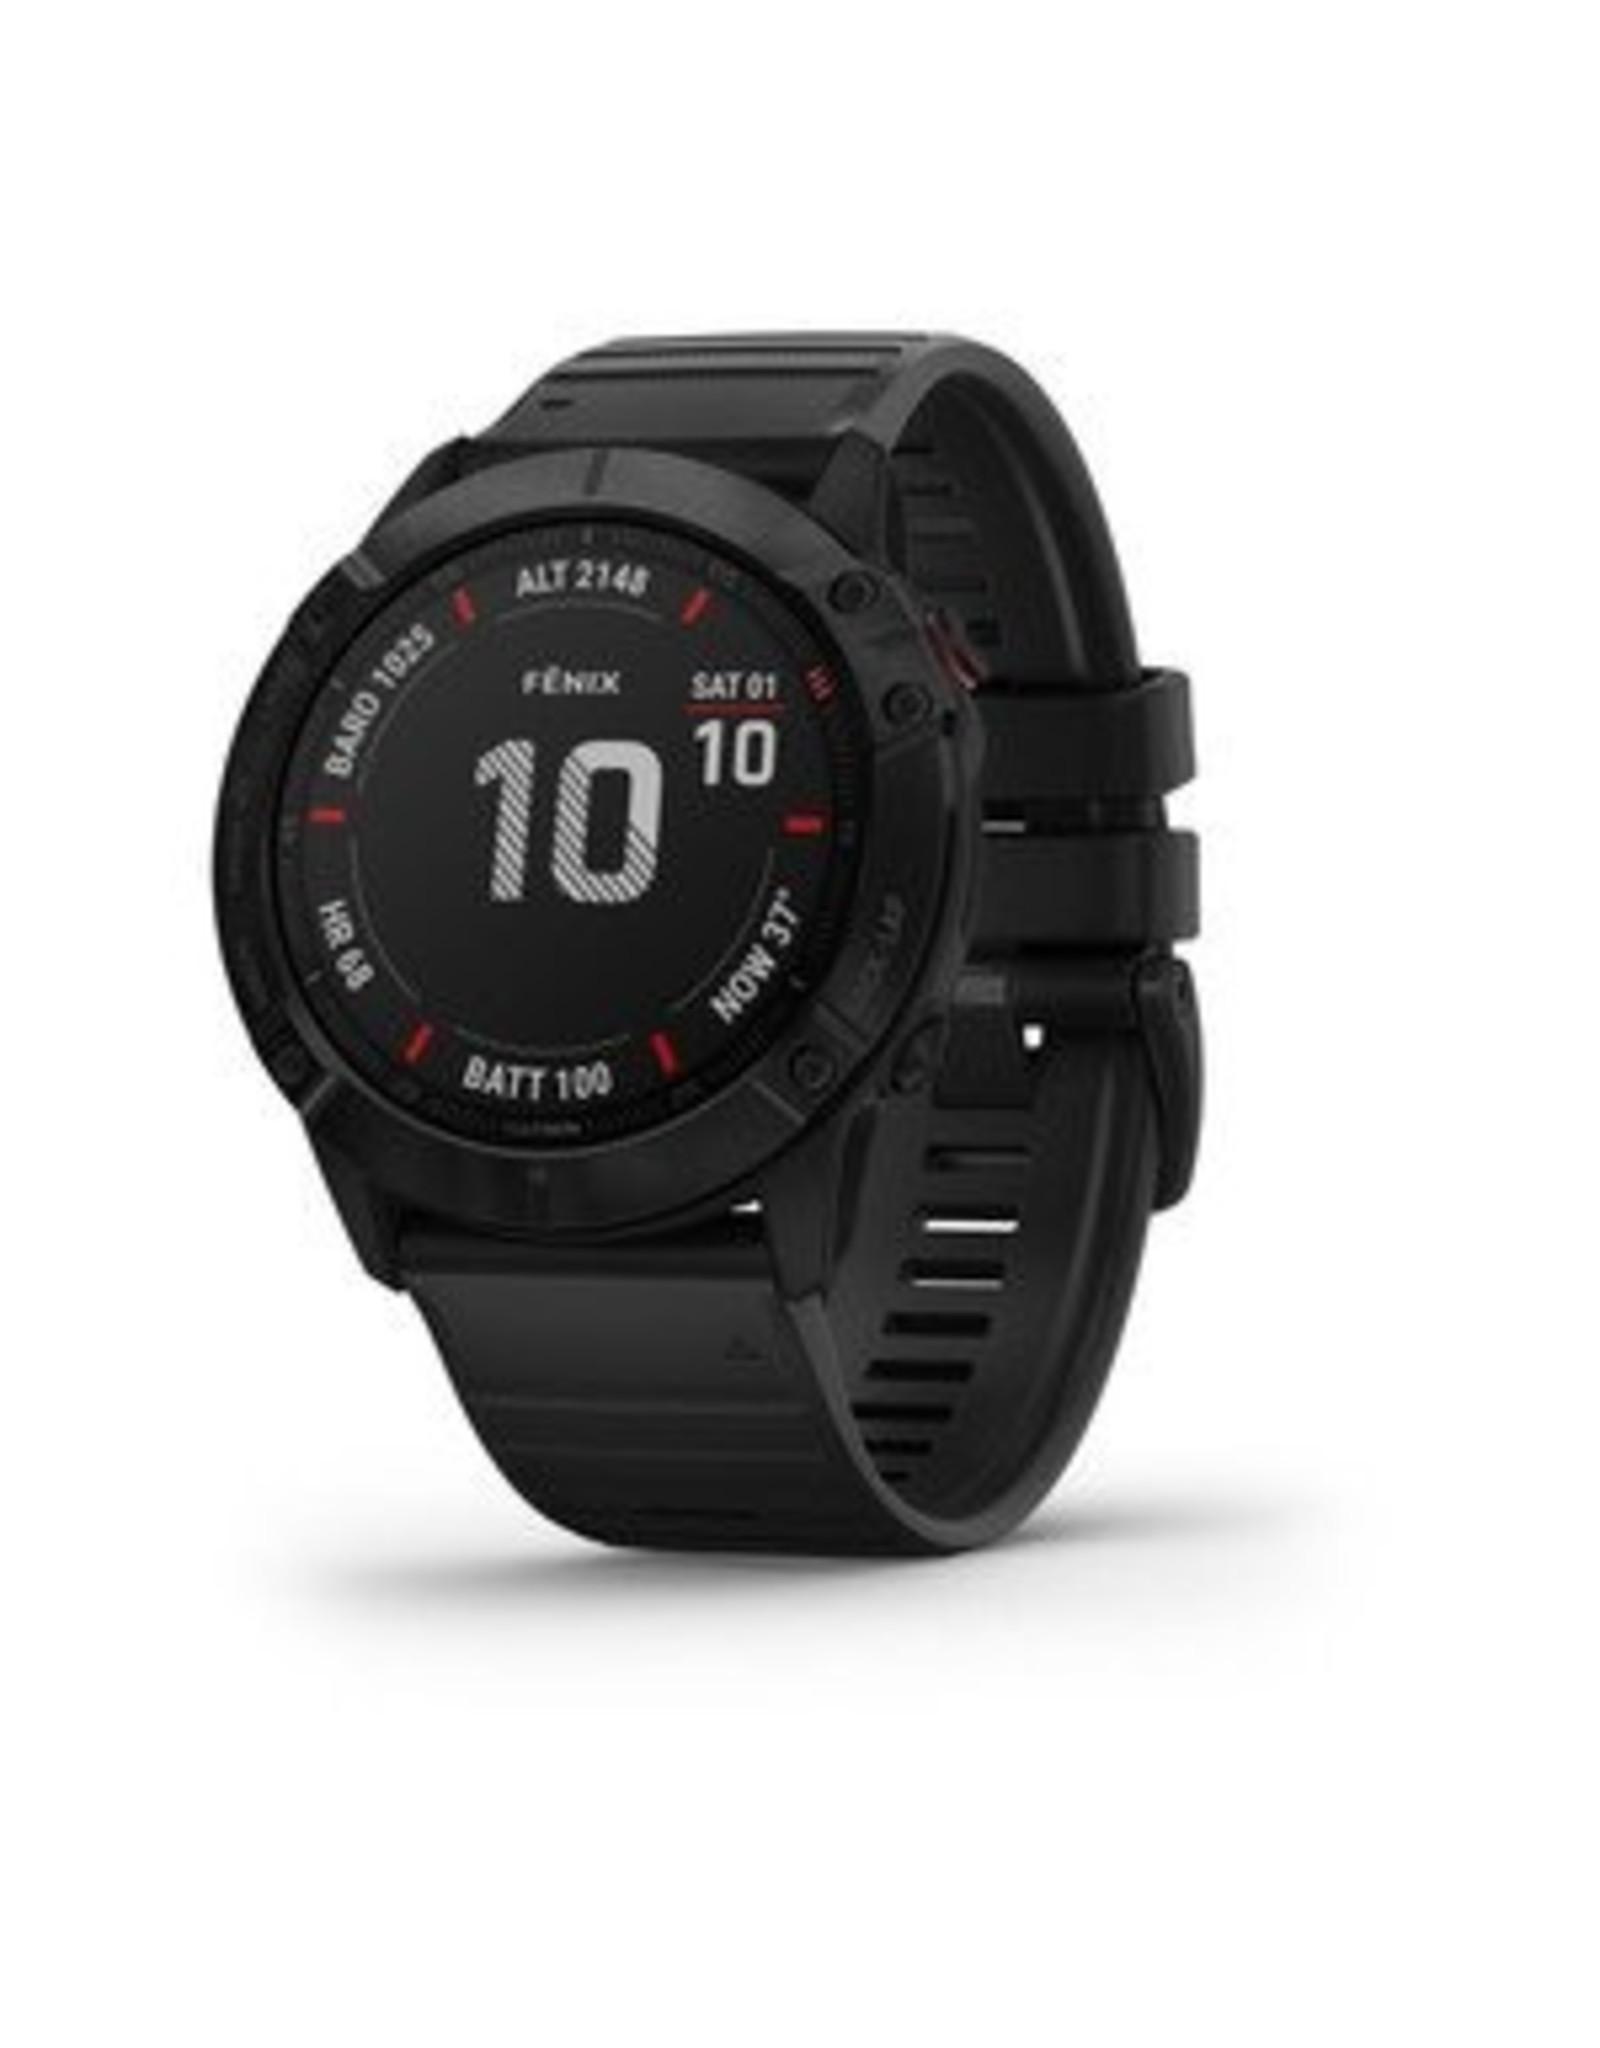 Garmin GARMIN FENIX 6 PRO BLACK W/BLACK BAND GPS